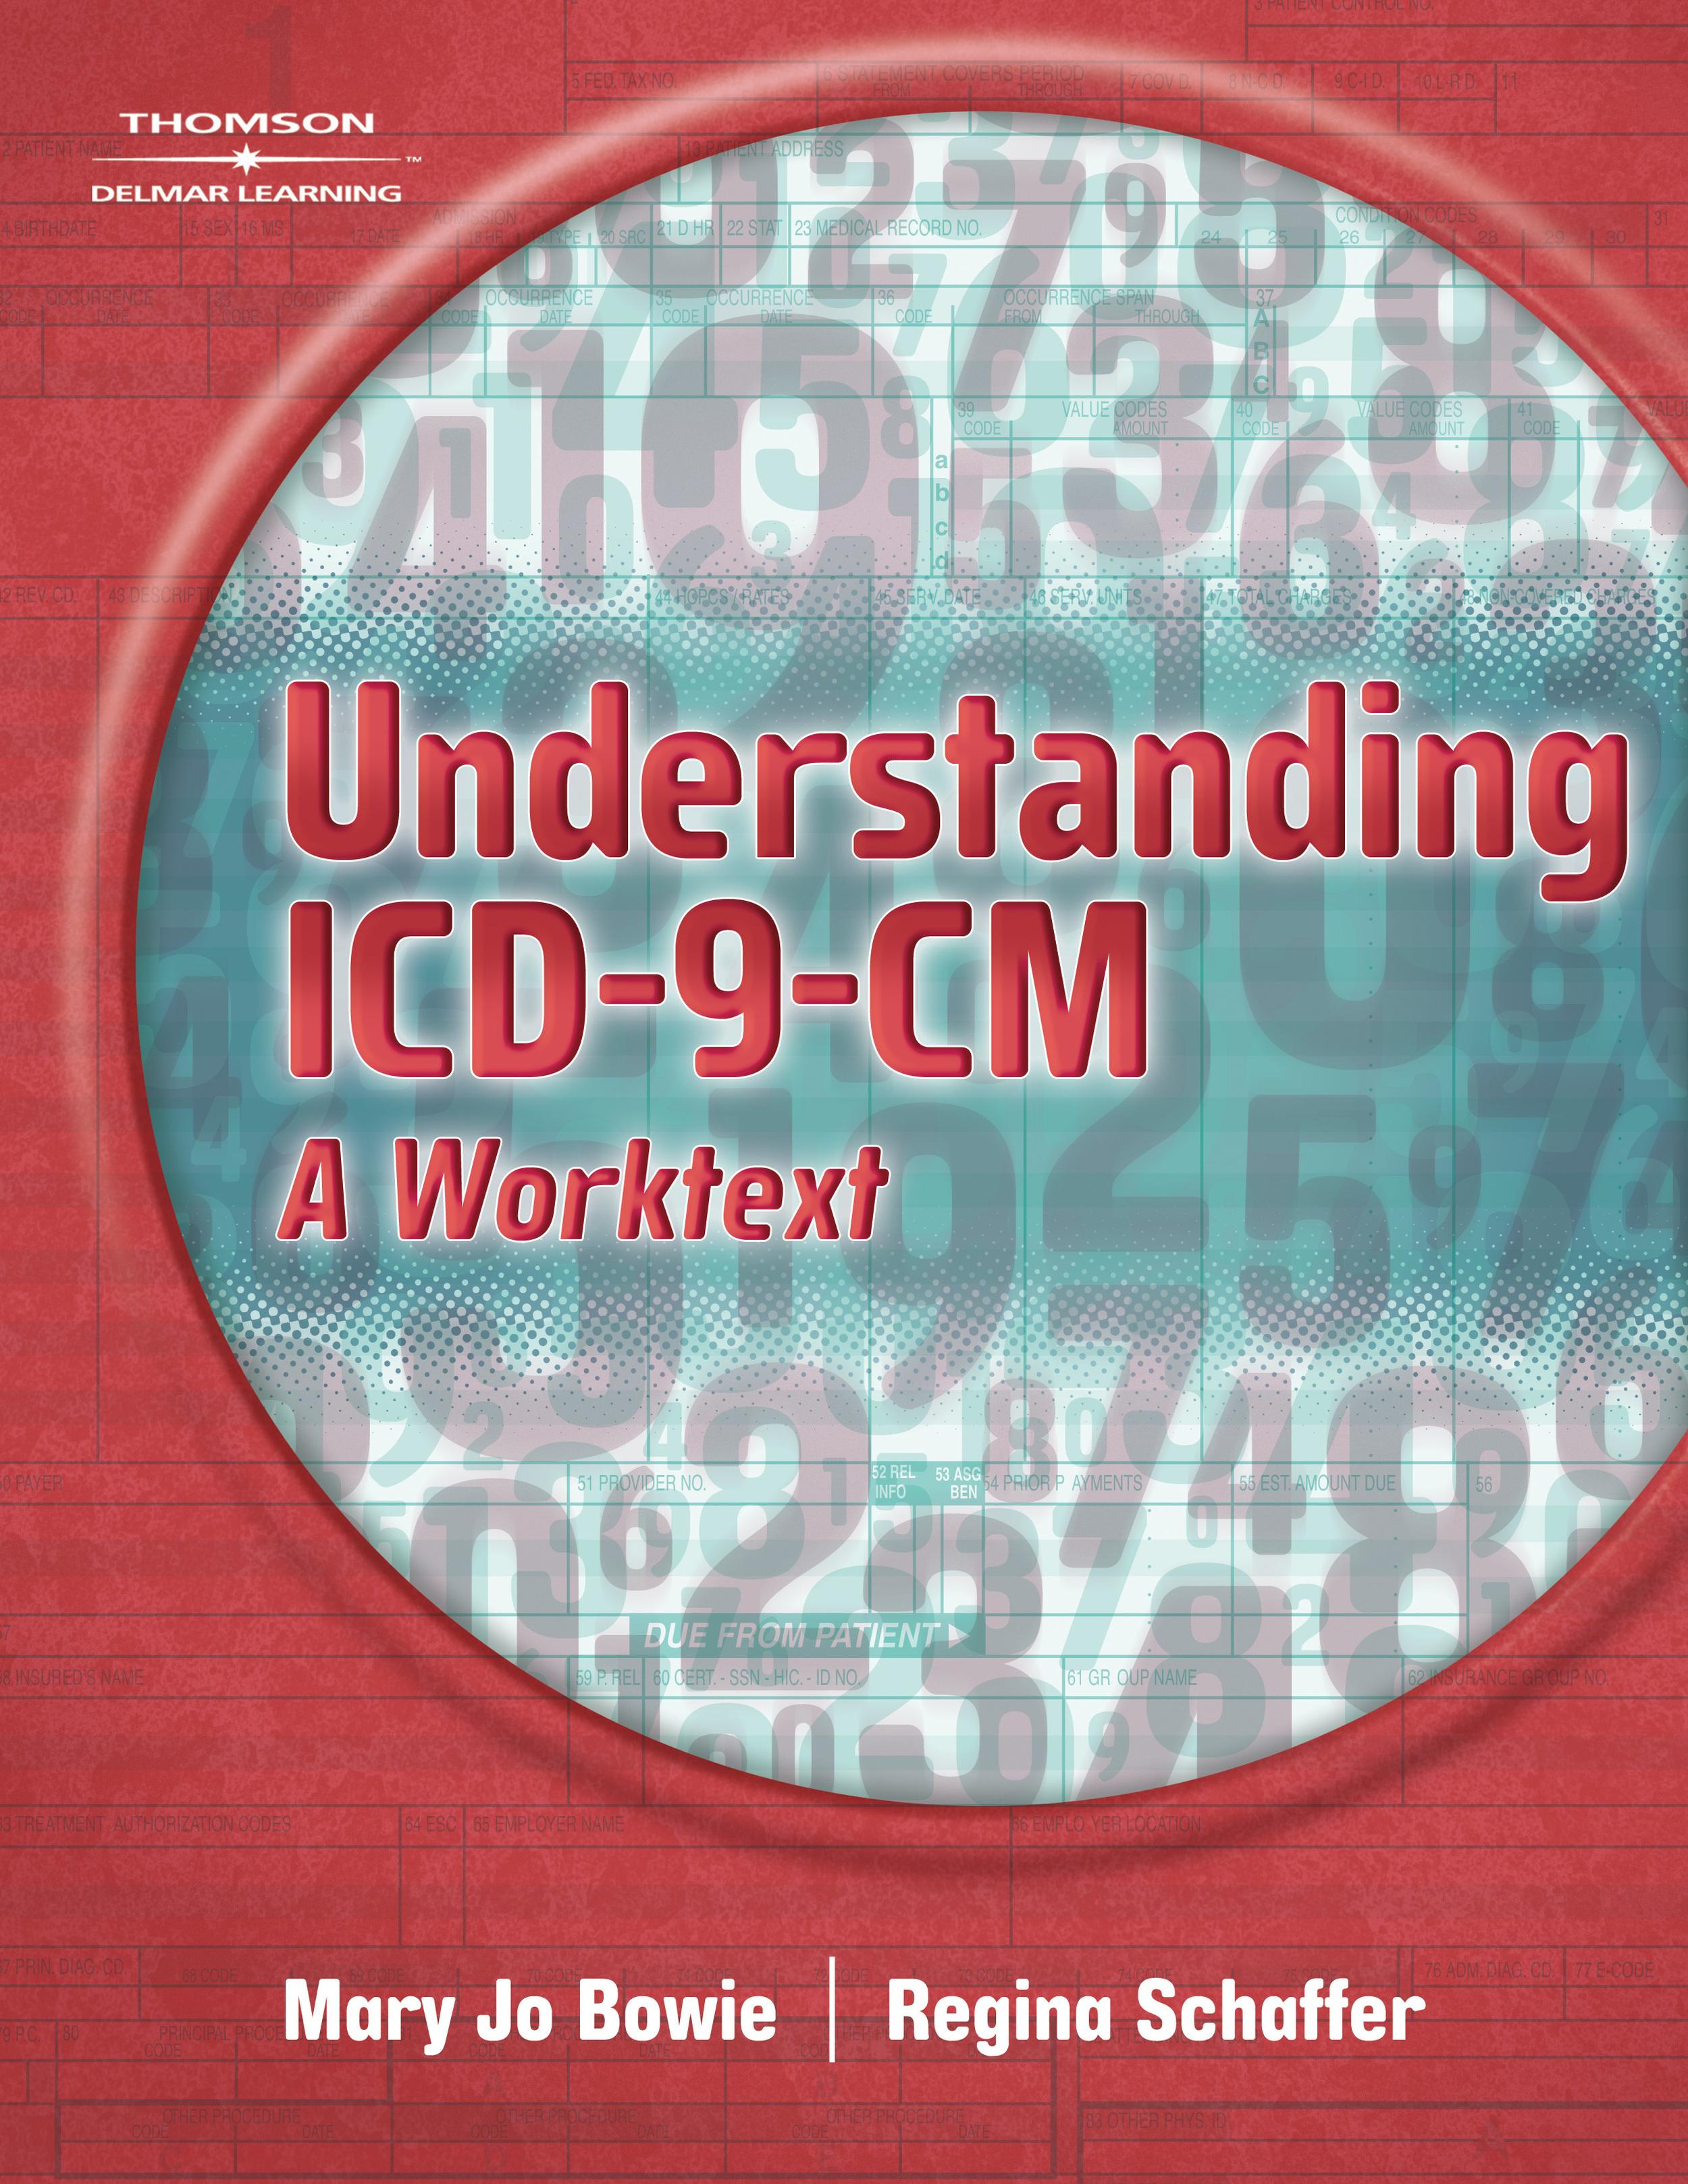 Understanding ICD-9-CM cover